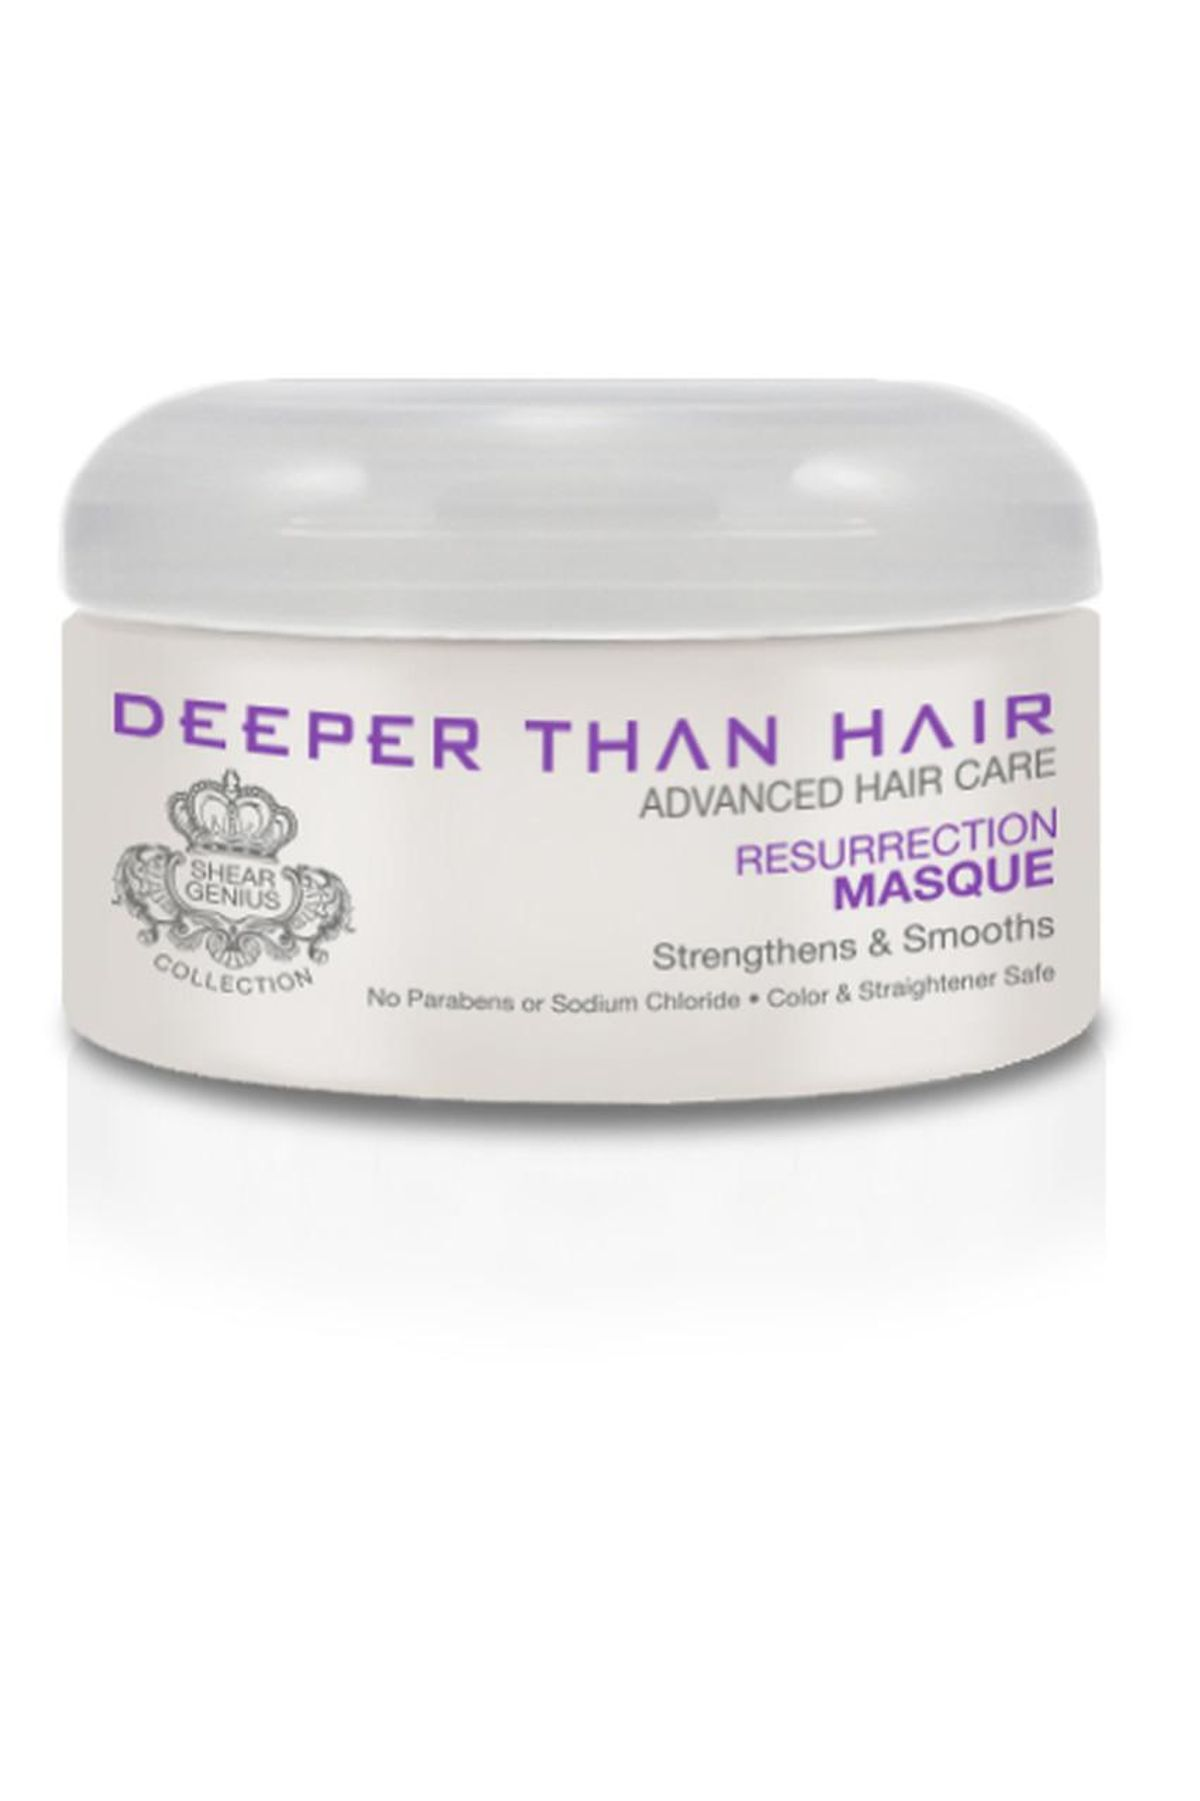 deeper than hair resurrection masque